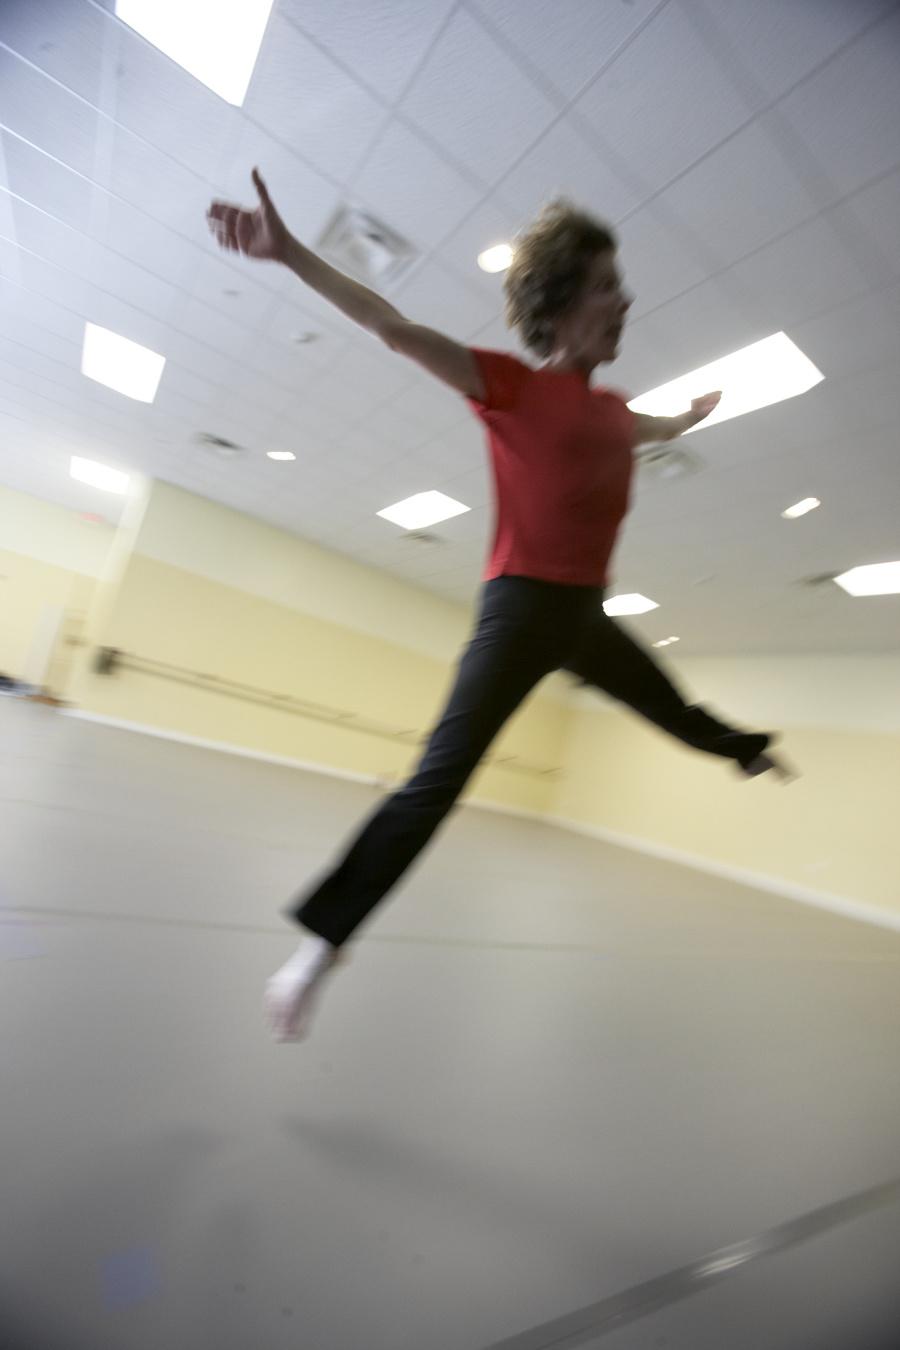 Gwyneth Jones midjump